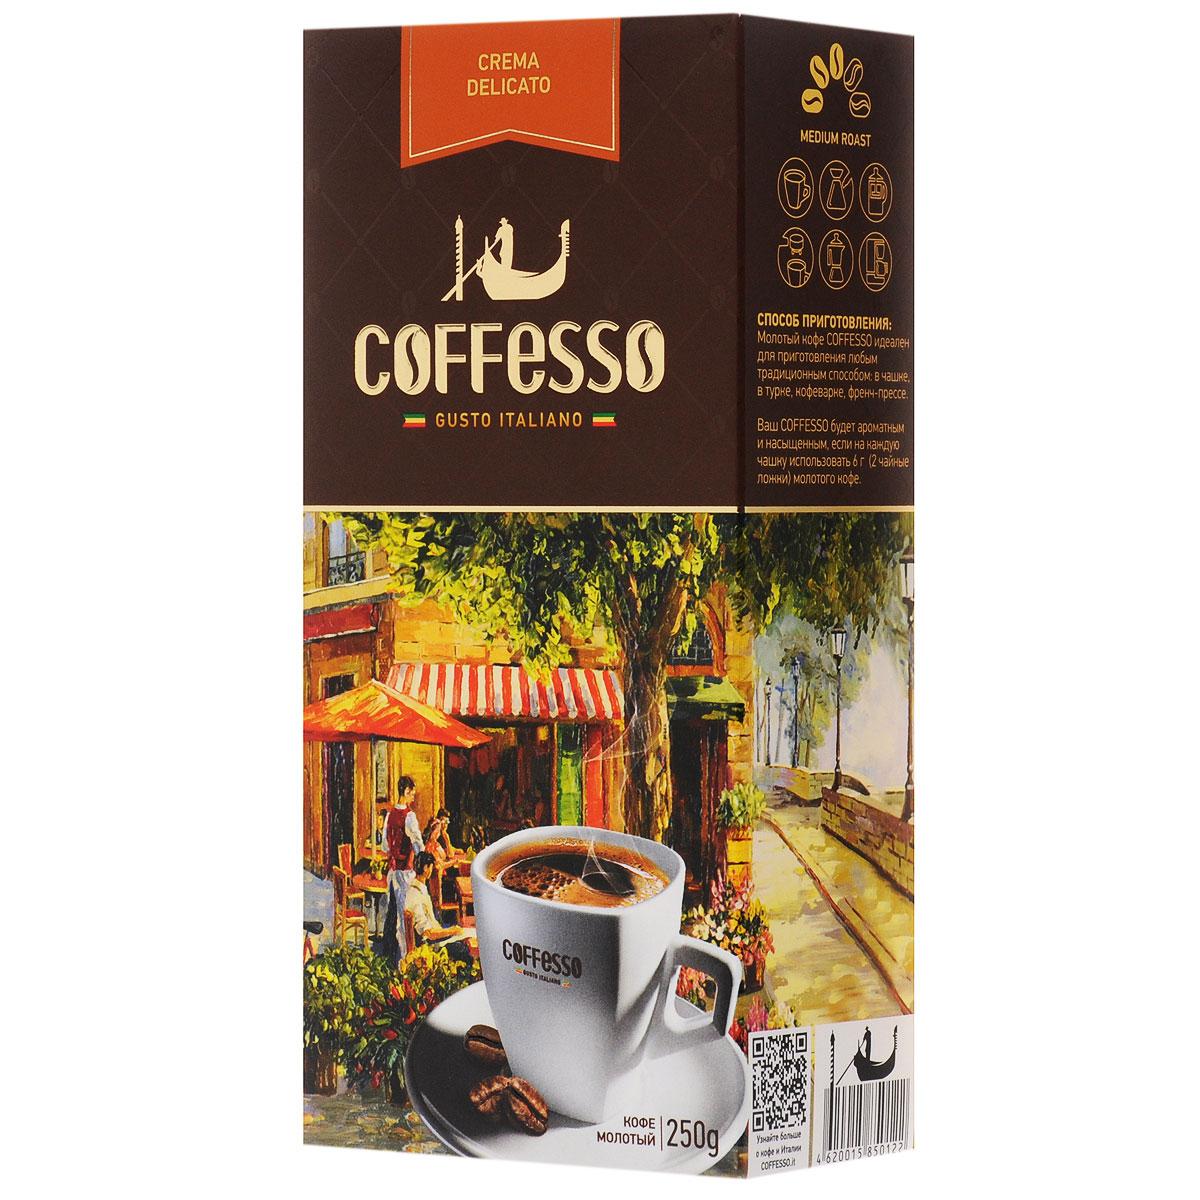 Coffesso Crema Delicato кофе молотый, 250 г